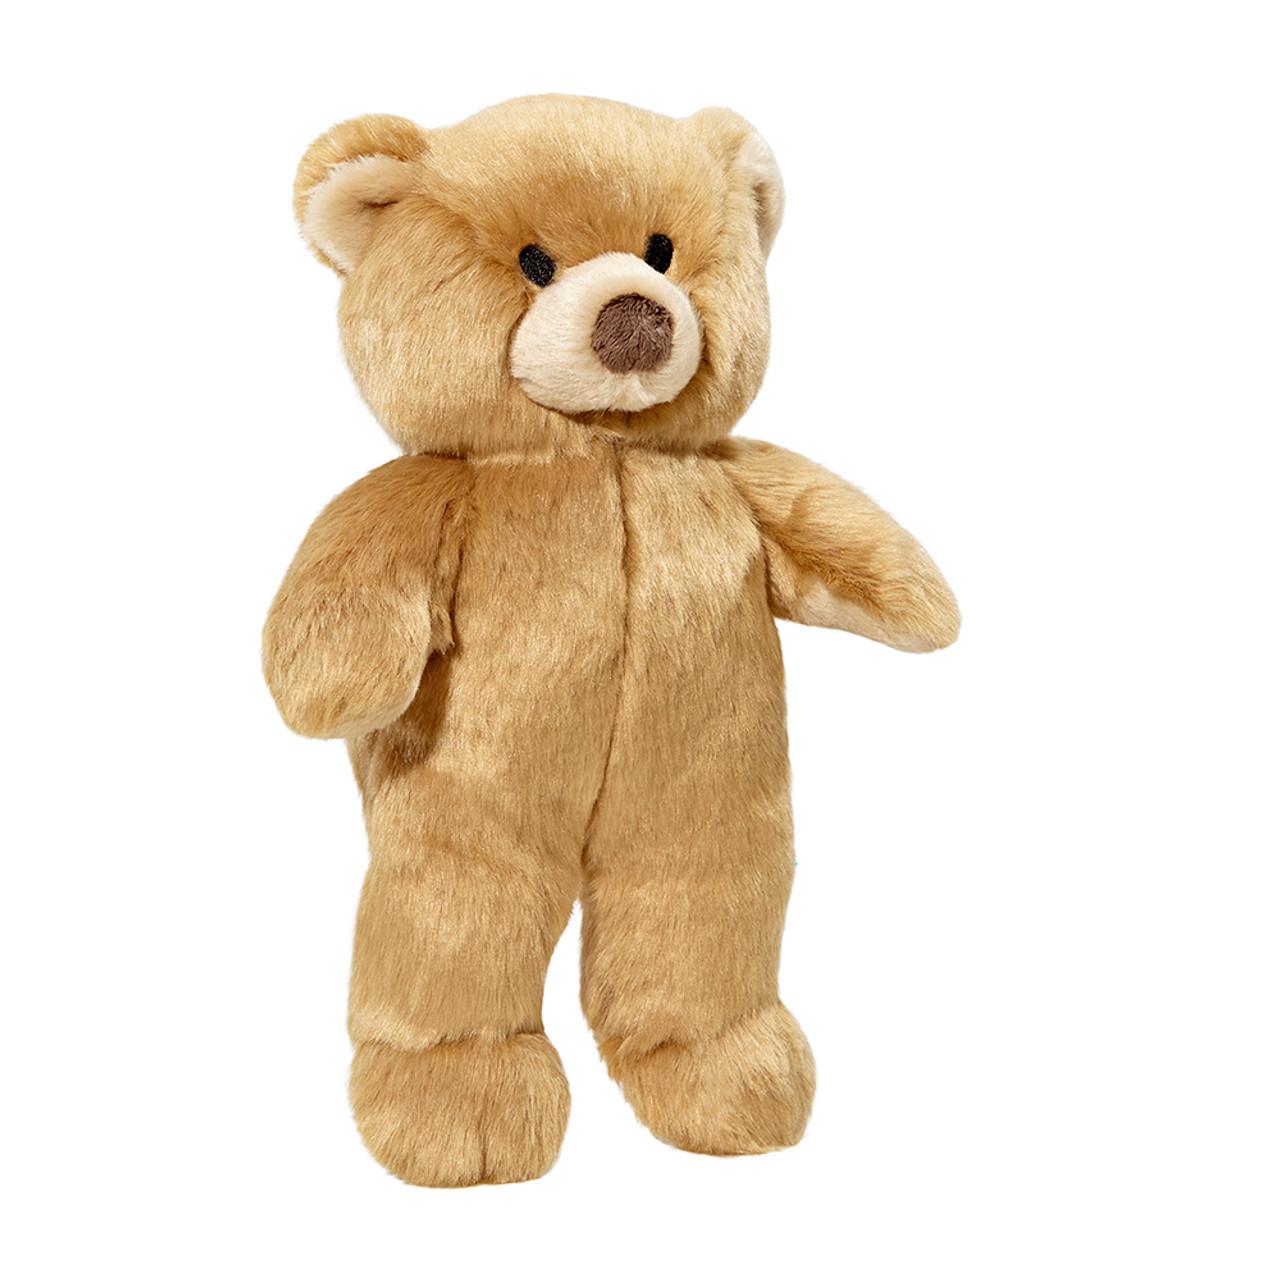 Fluff & Tuff Mr. Honey Bear Plush Dog Toy